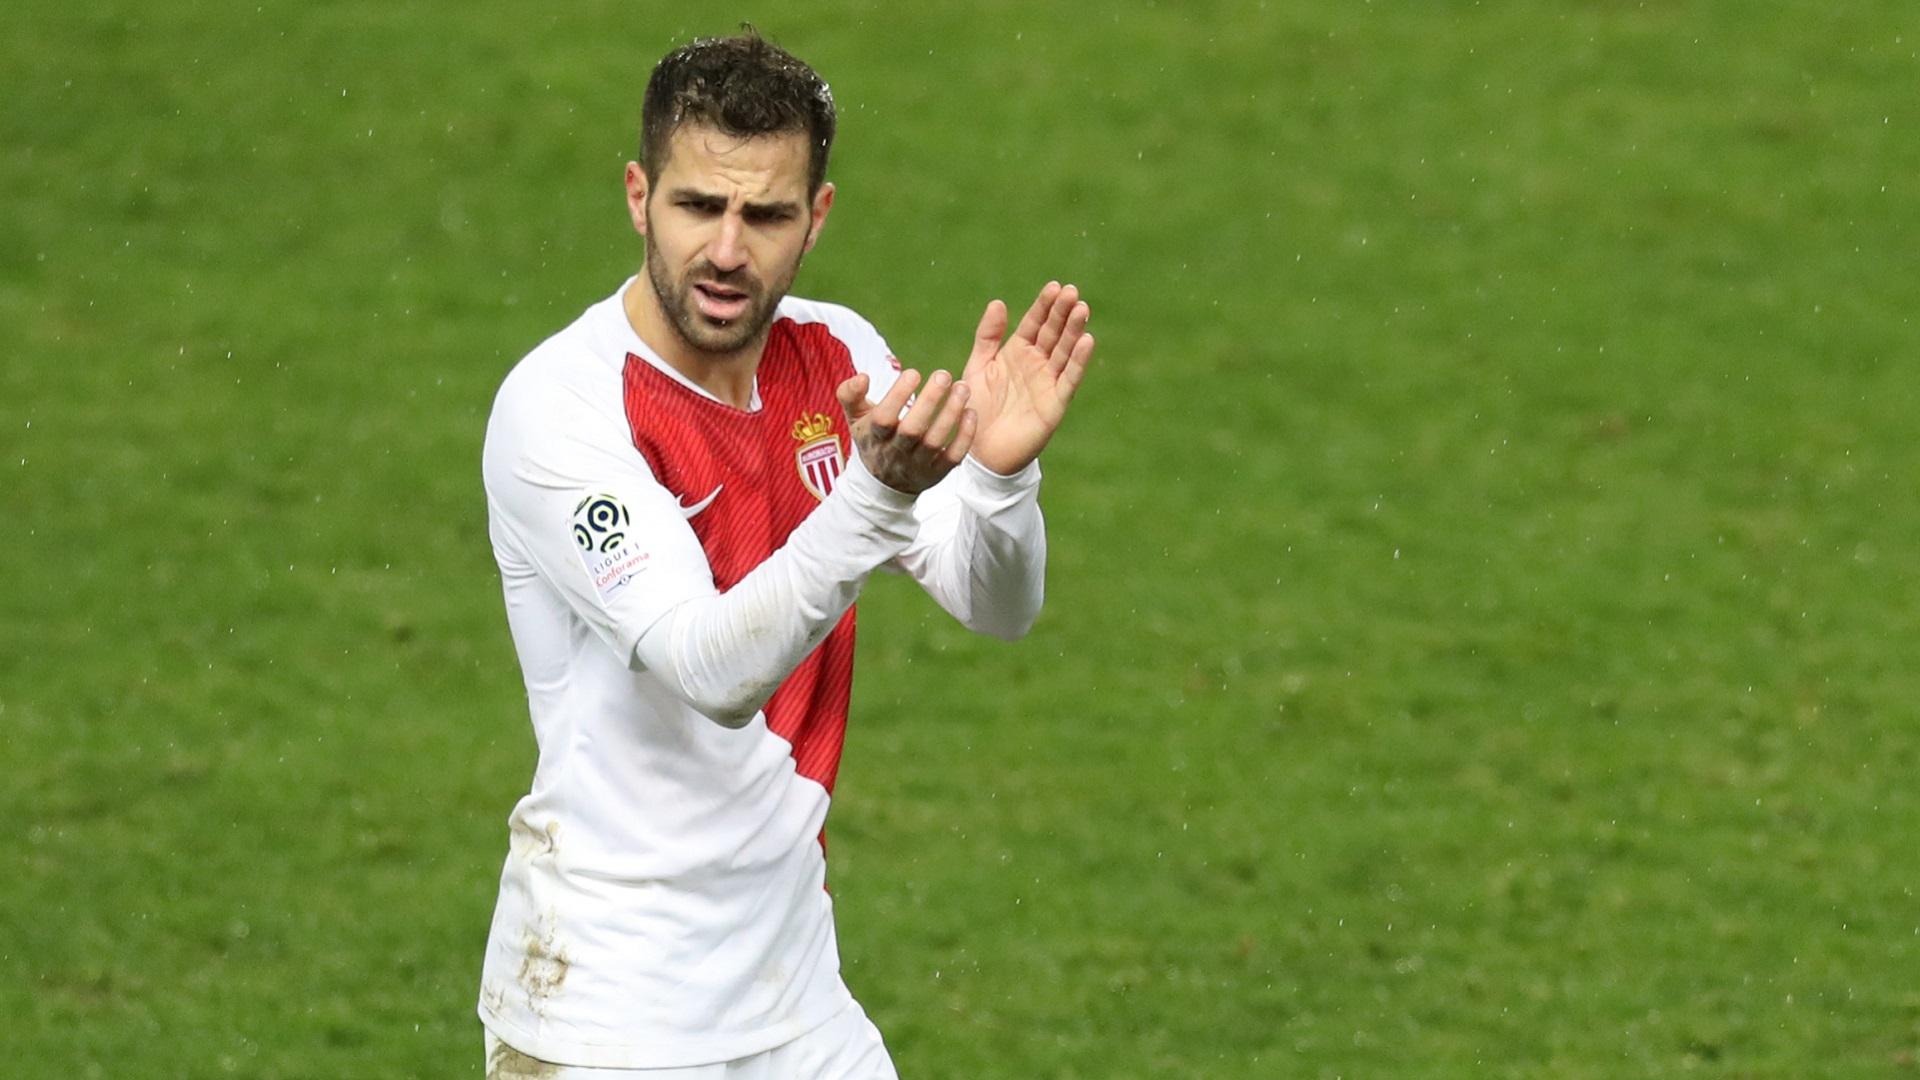 2019-02-03 Cesc Fabregas Monaco